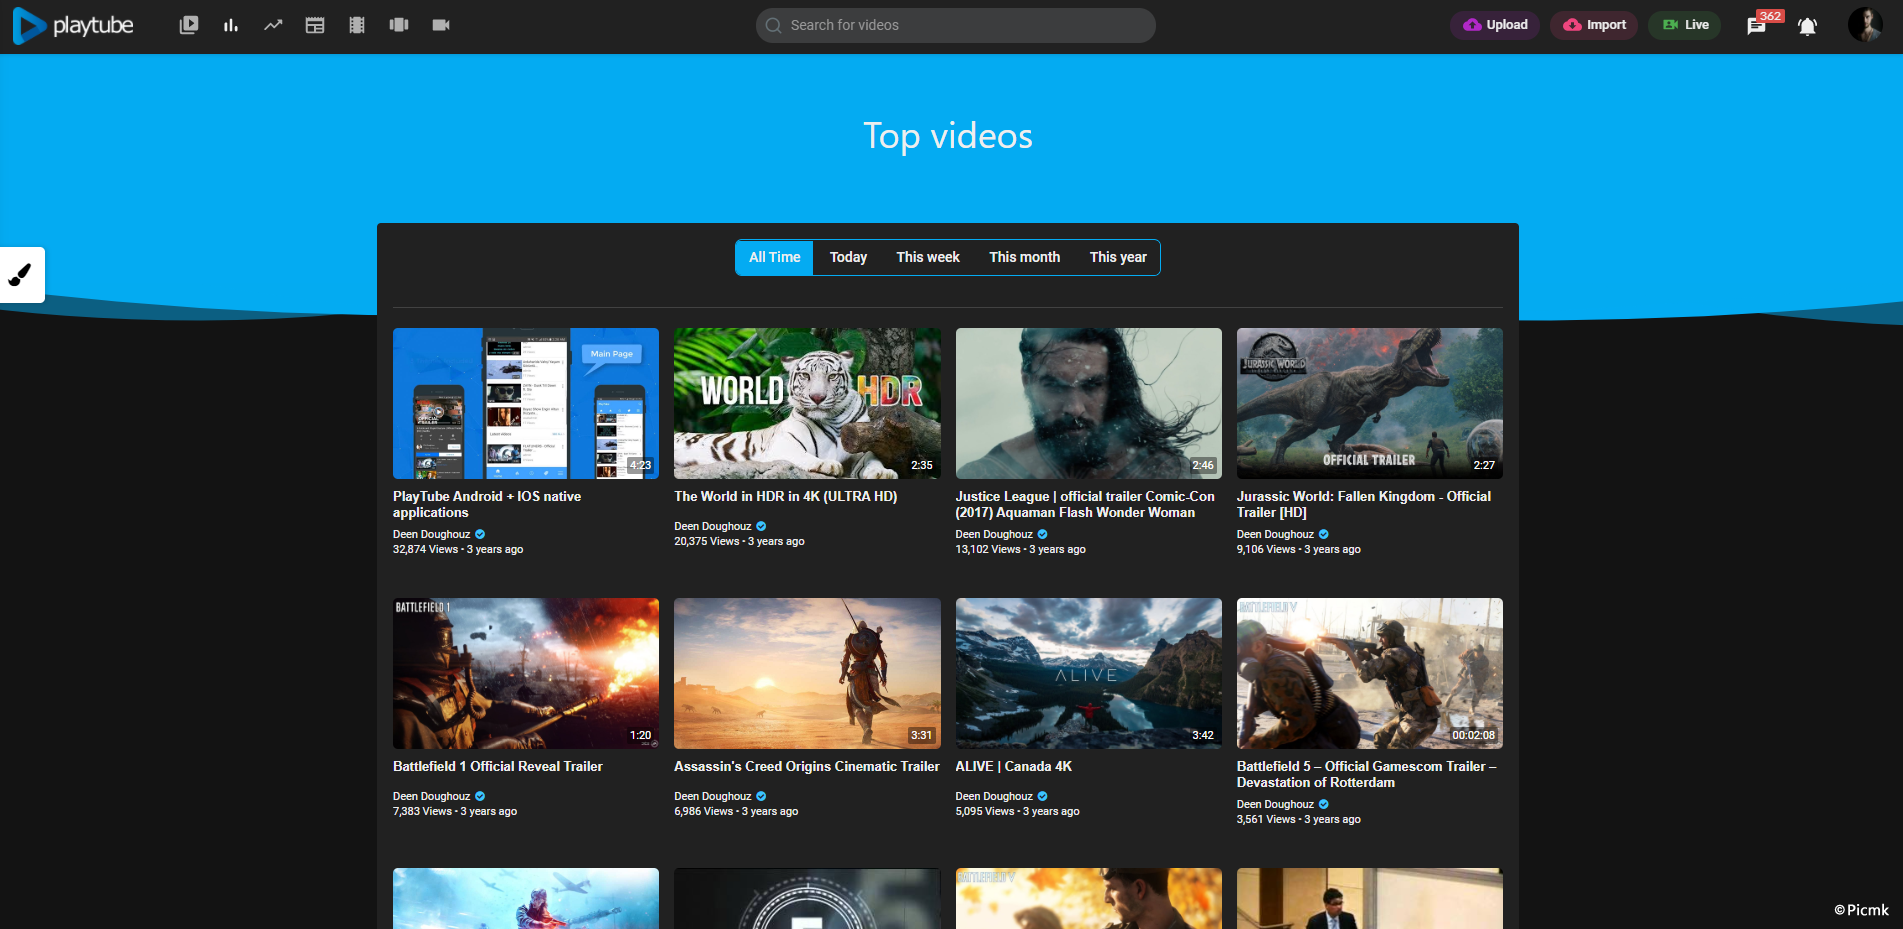 PlayTube v2.0.3 - 國外高級PHP視頻係統源碼 & PHP視頻分享平台源碼插圖3